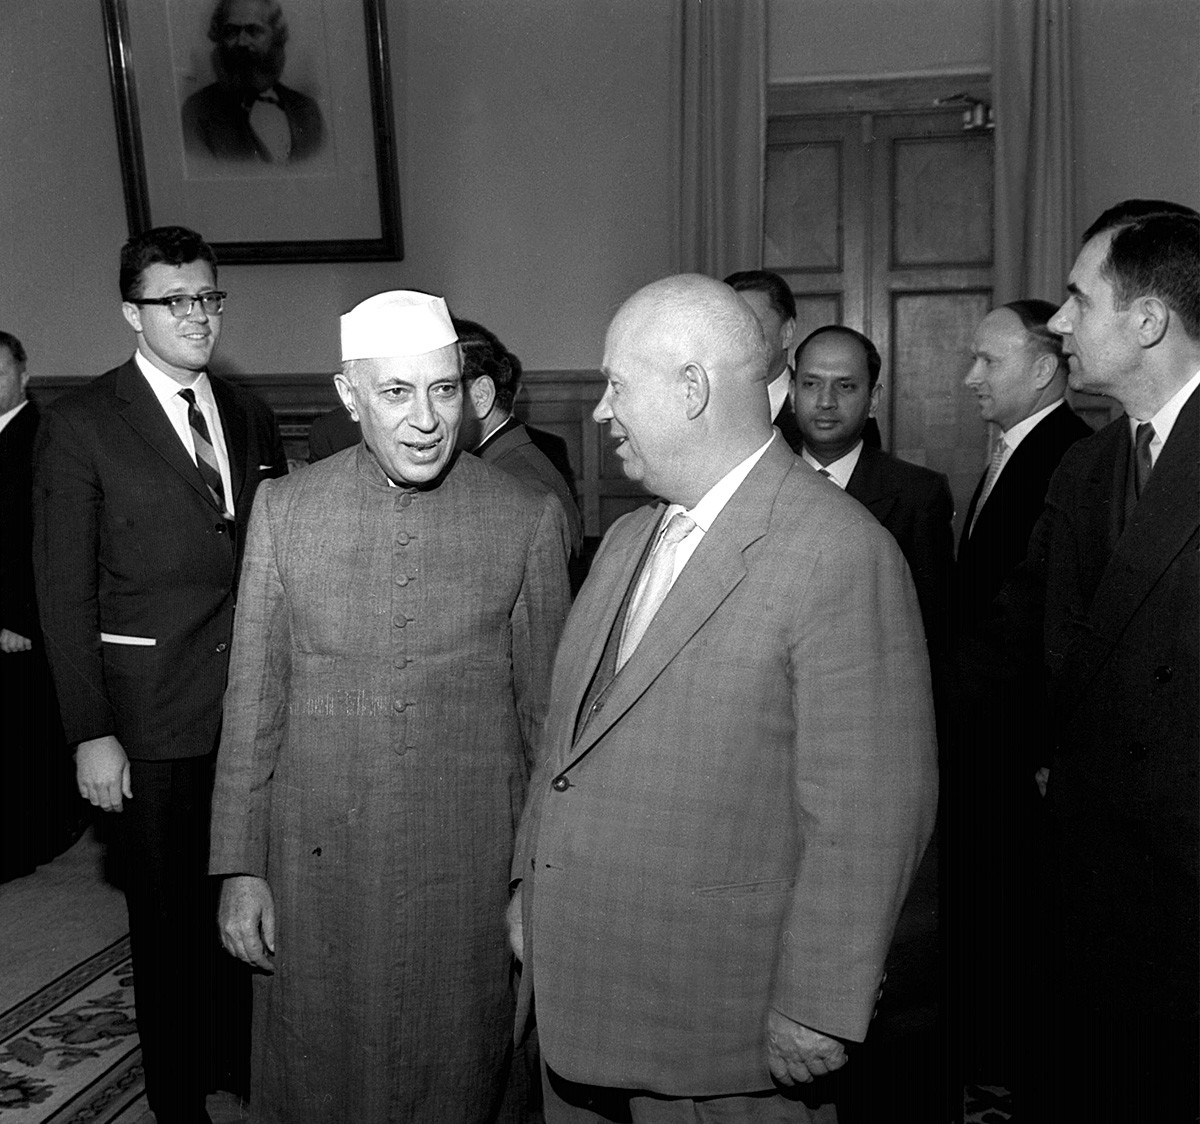 Nikita Jrushchov y Jawaharlal Nehru en Moscú, 1962.